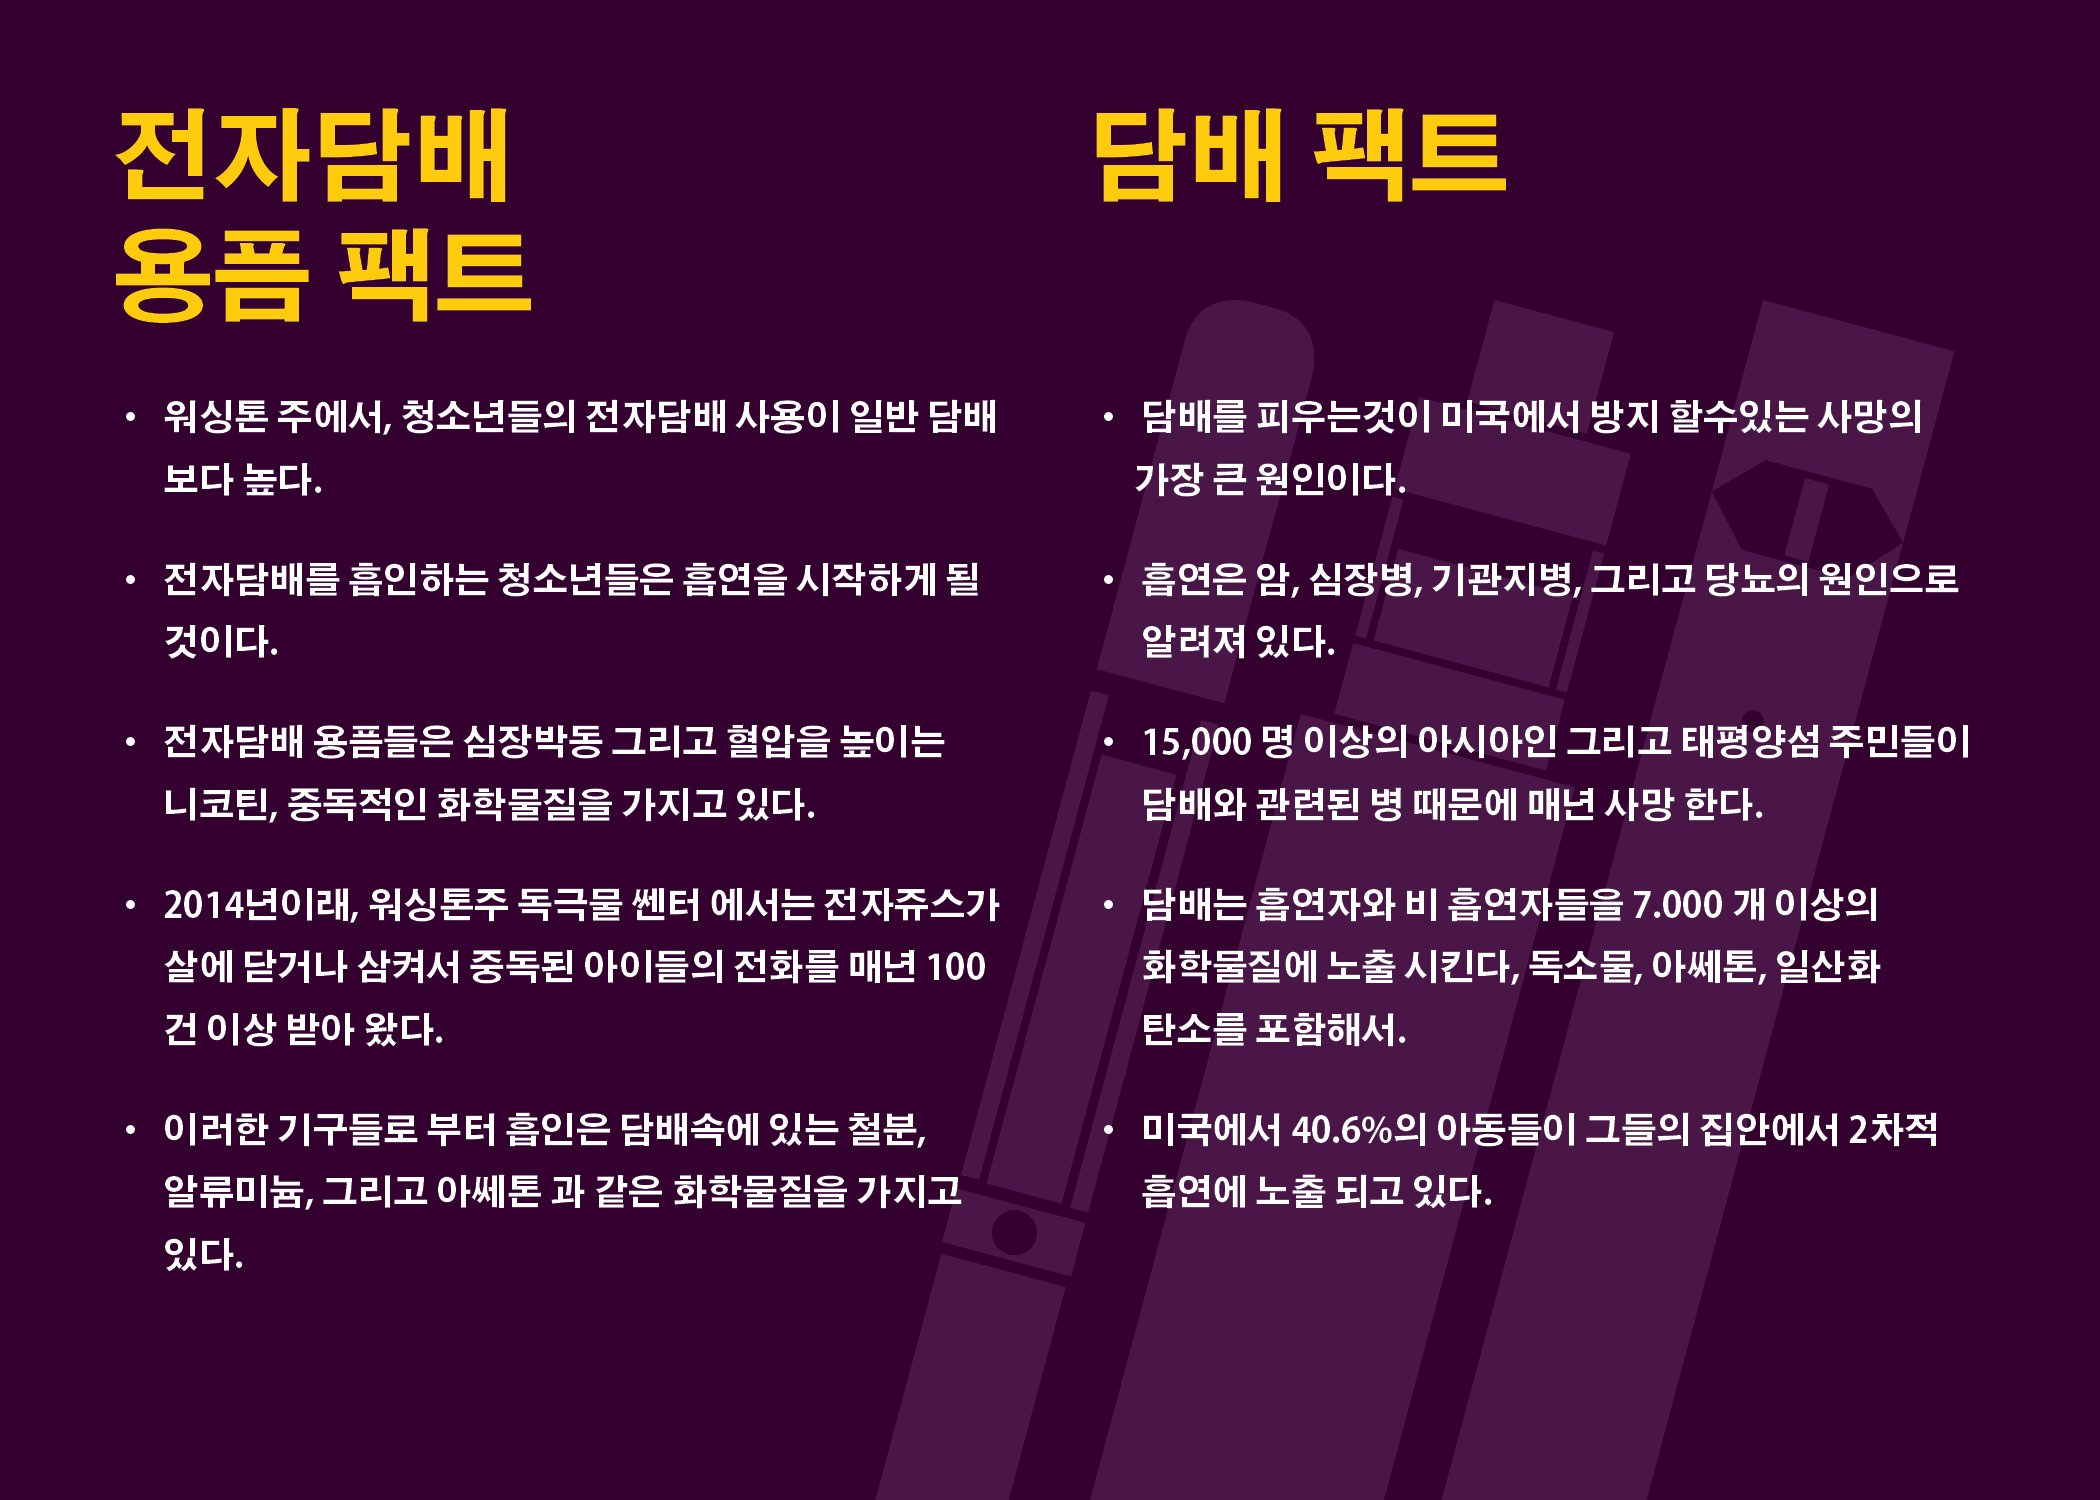 dbf_flyer_back_korean